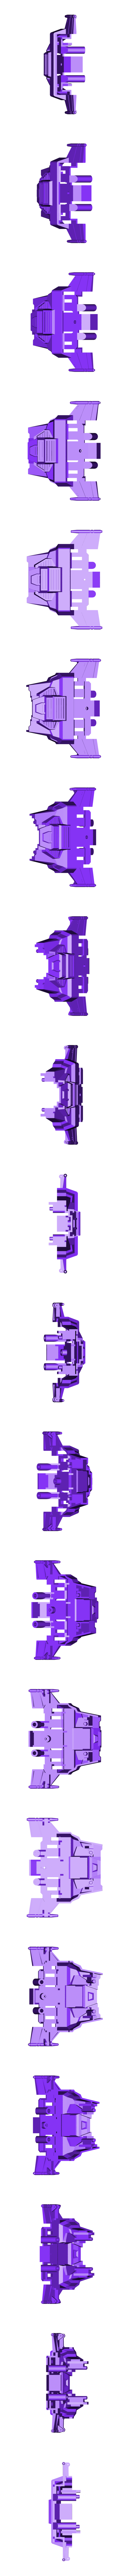 Chest2.stl Download STL file KO TFC Uranos Upgrade Kit IDW Ver • 3D printer object, Toymakr3D